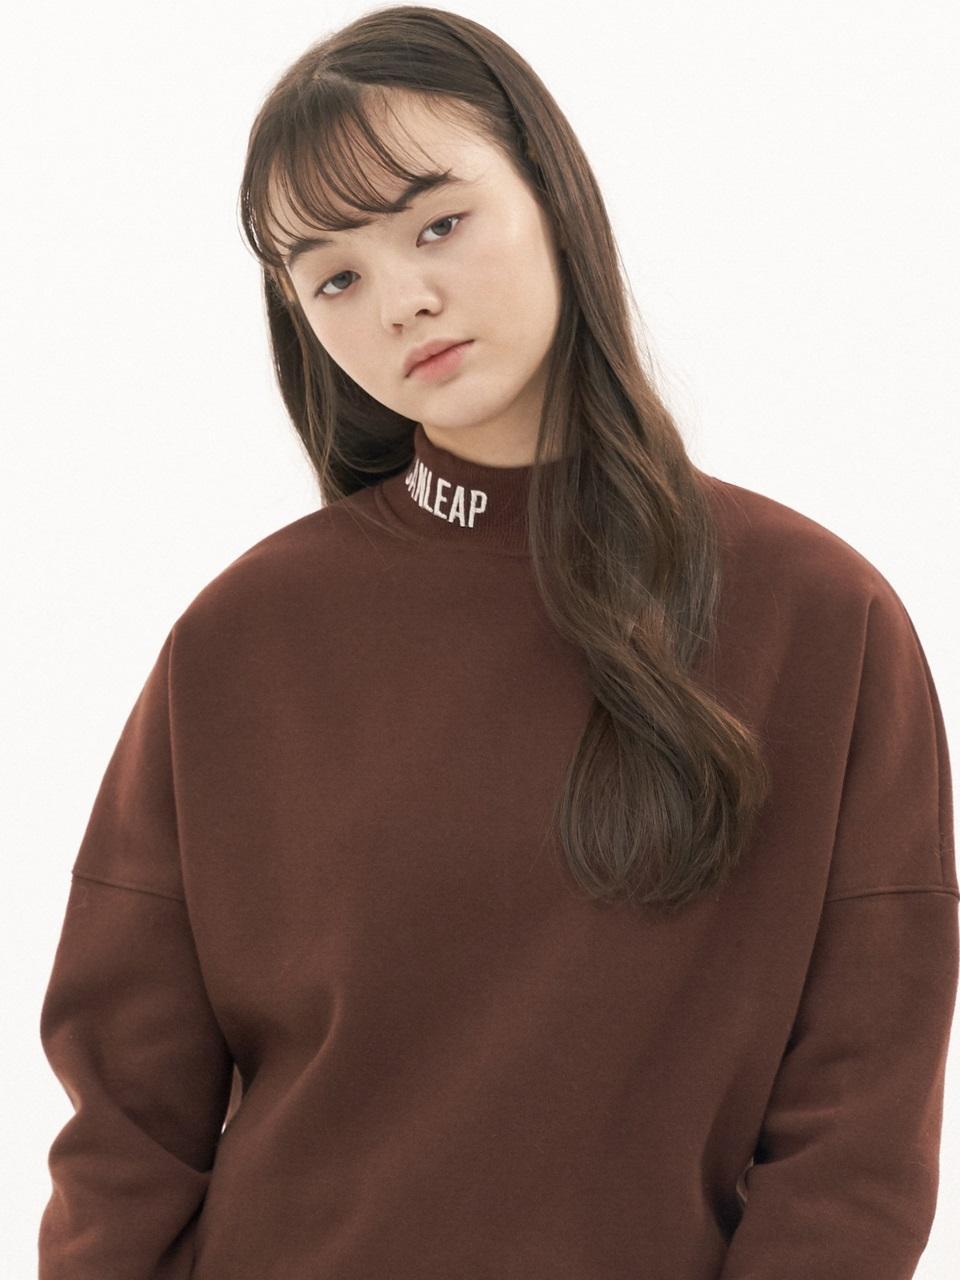 CANLEAP国际品牌品牌2020春夏宽松落肩LOGO字母刺绣高领女士拉绒卫衣_棕色